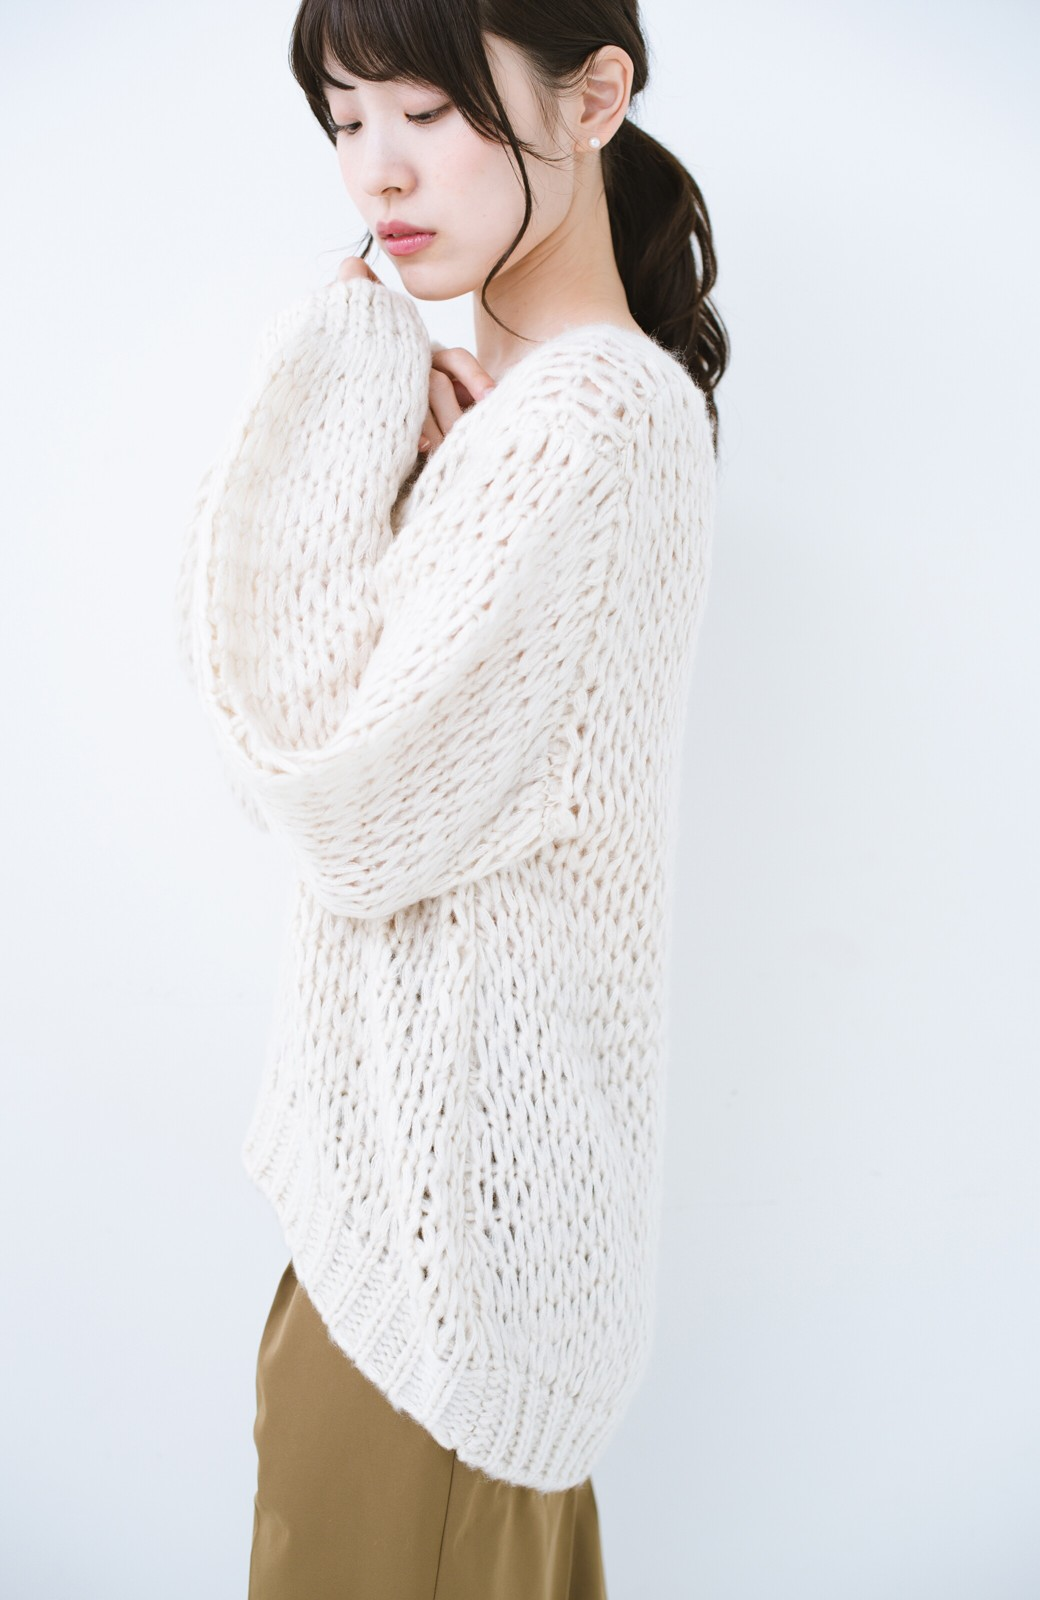 haco! 手編み風のざっくり感で女っぽい Vネックの甘編みルーズニット <アイボリー>の商品写真14